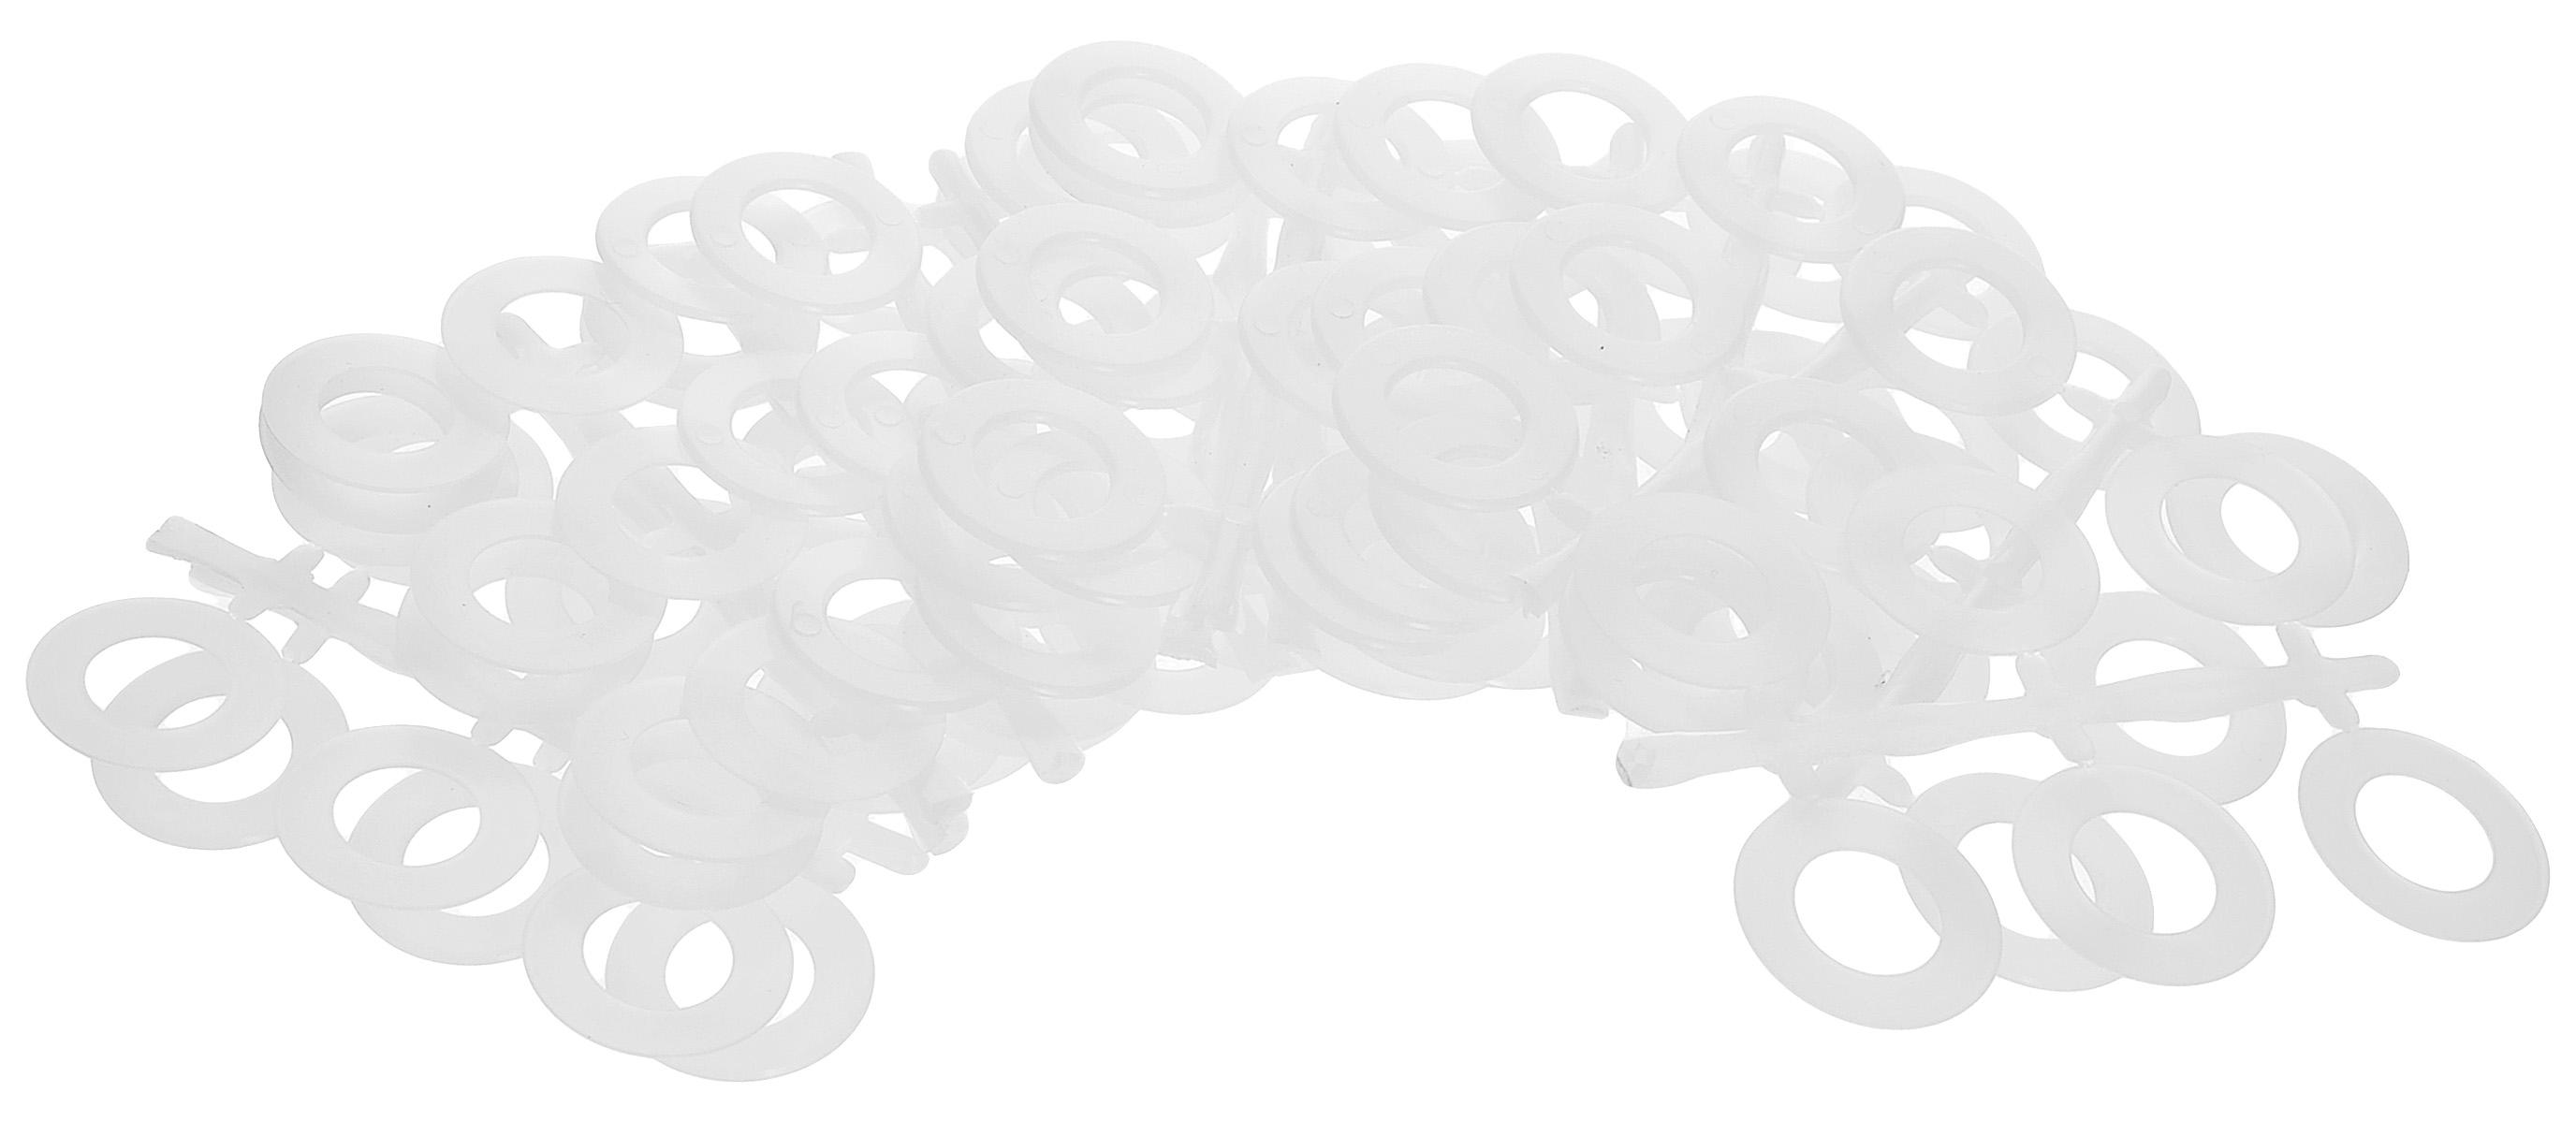 Кольца для обвязывания крючком